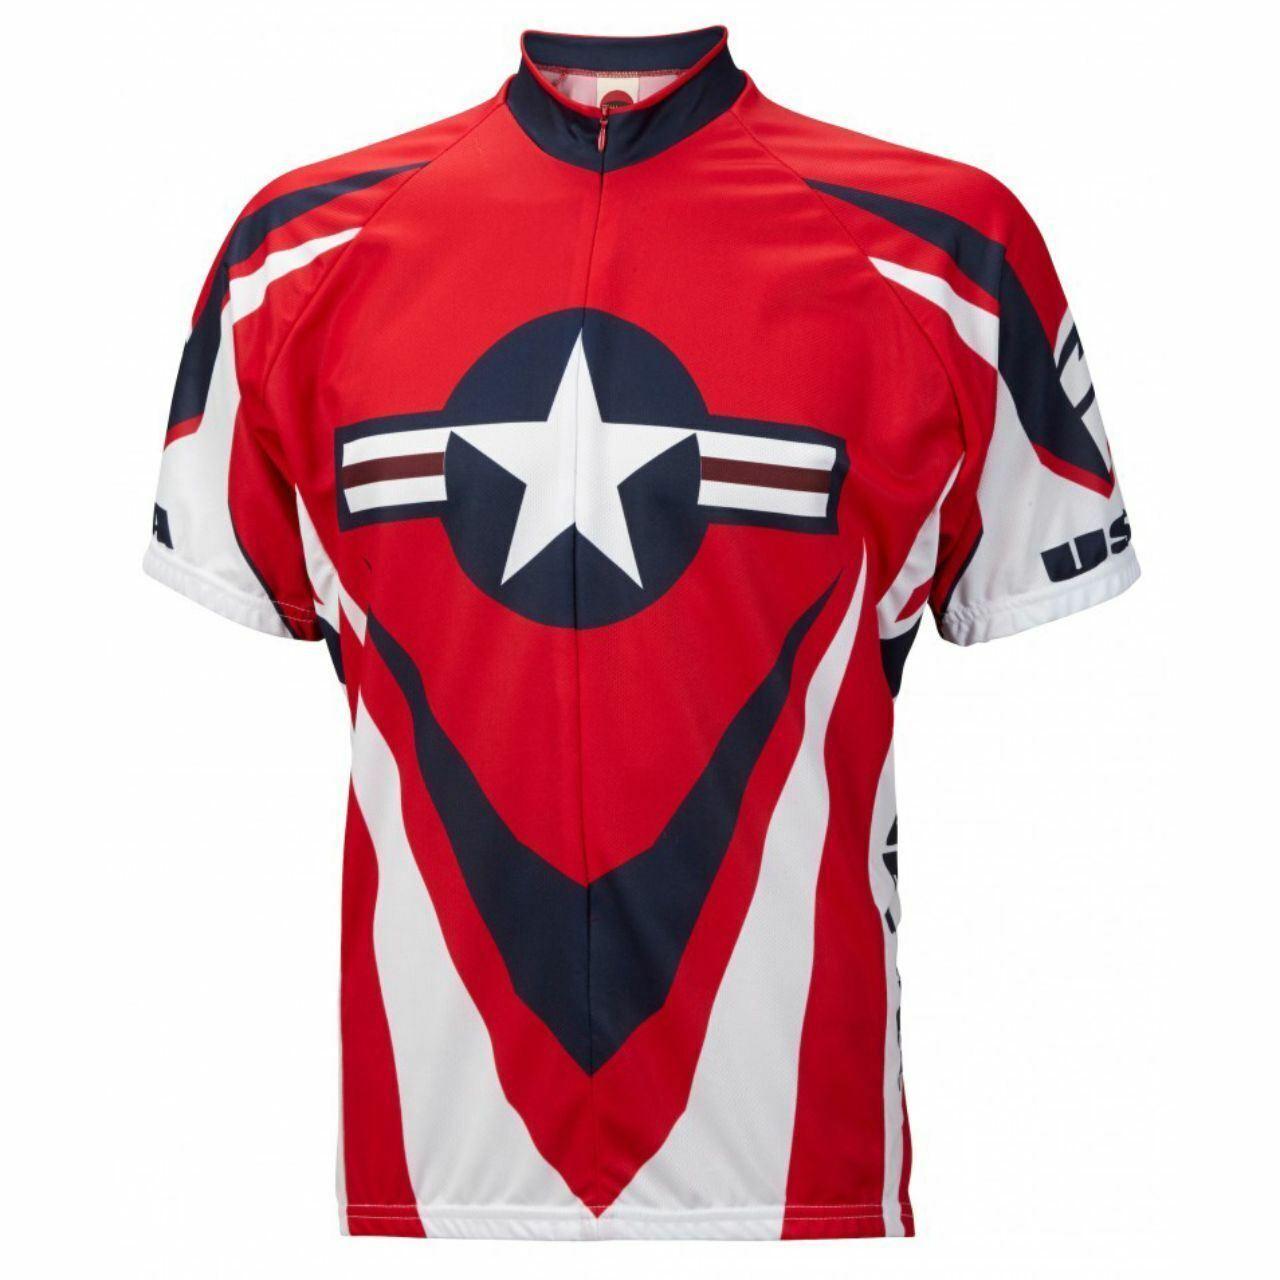 Paseo de EE. UU. Gratis Para Hombre Manga Corta Media Cremallera Ciclismo Camiseta